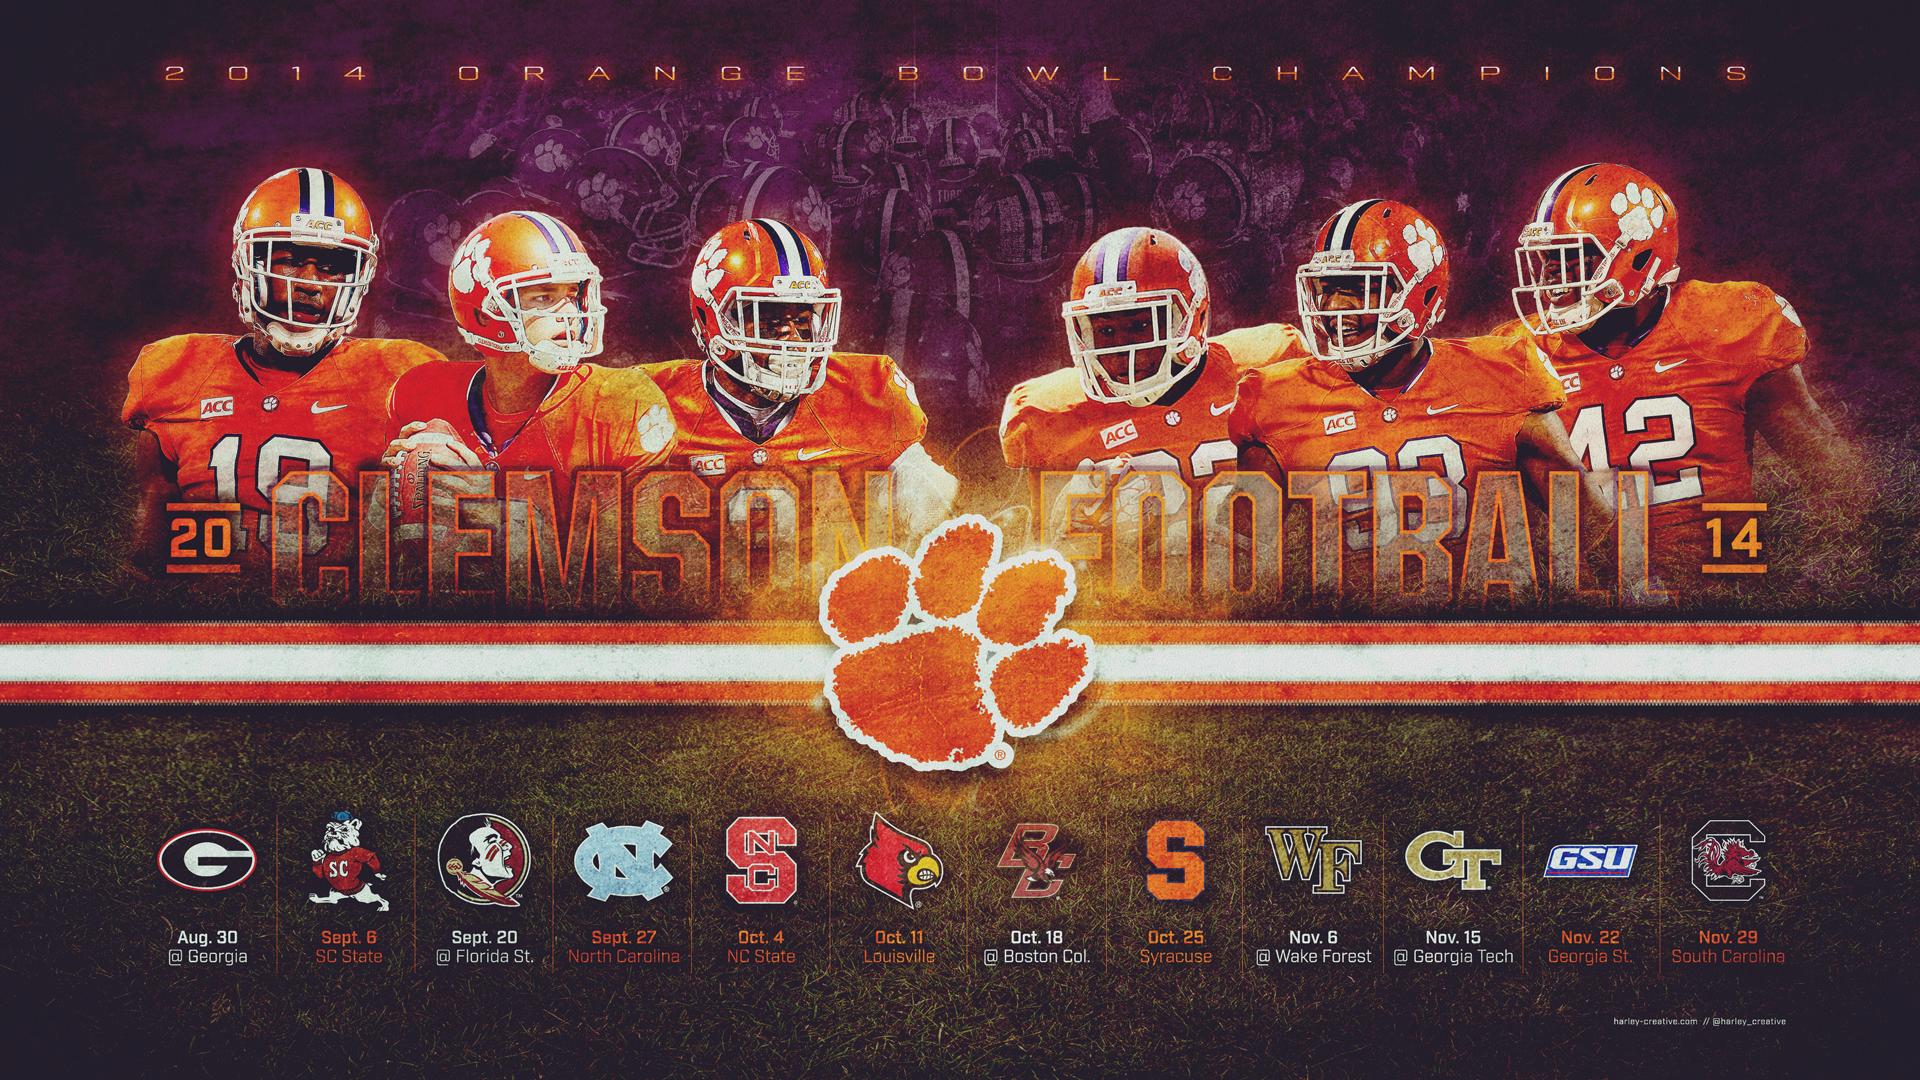 Clemson Desktop Wallpaper Posted By Christopher Peltier